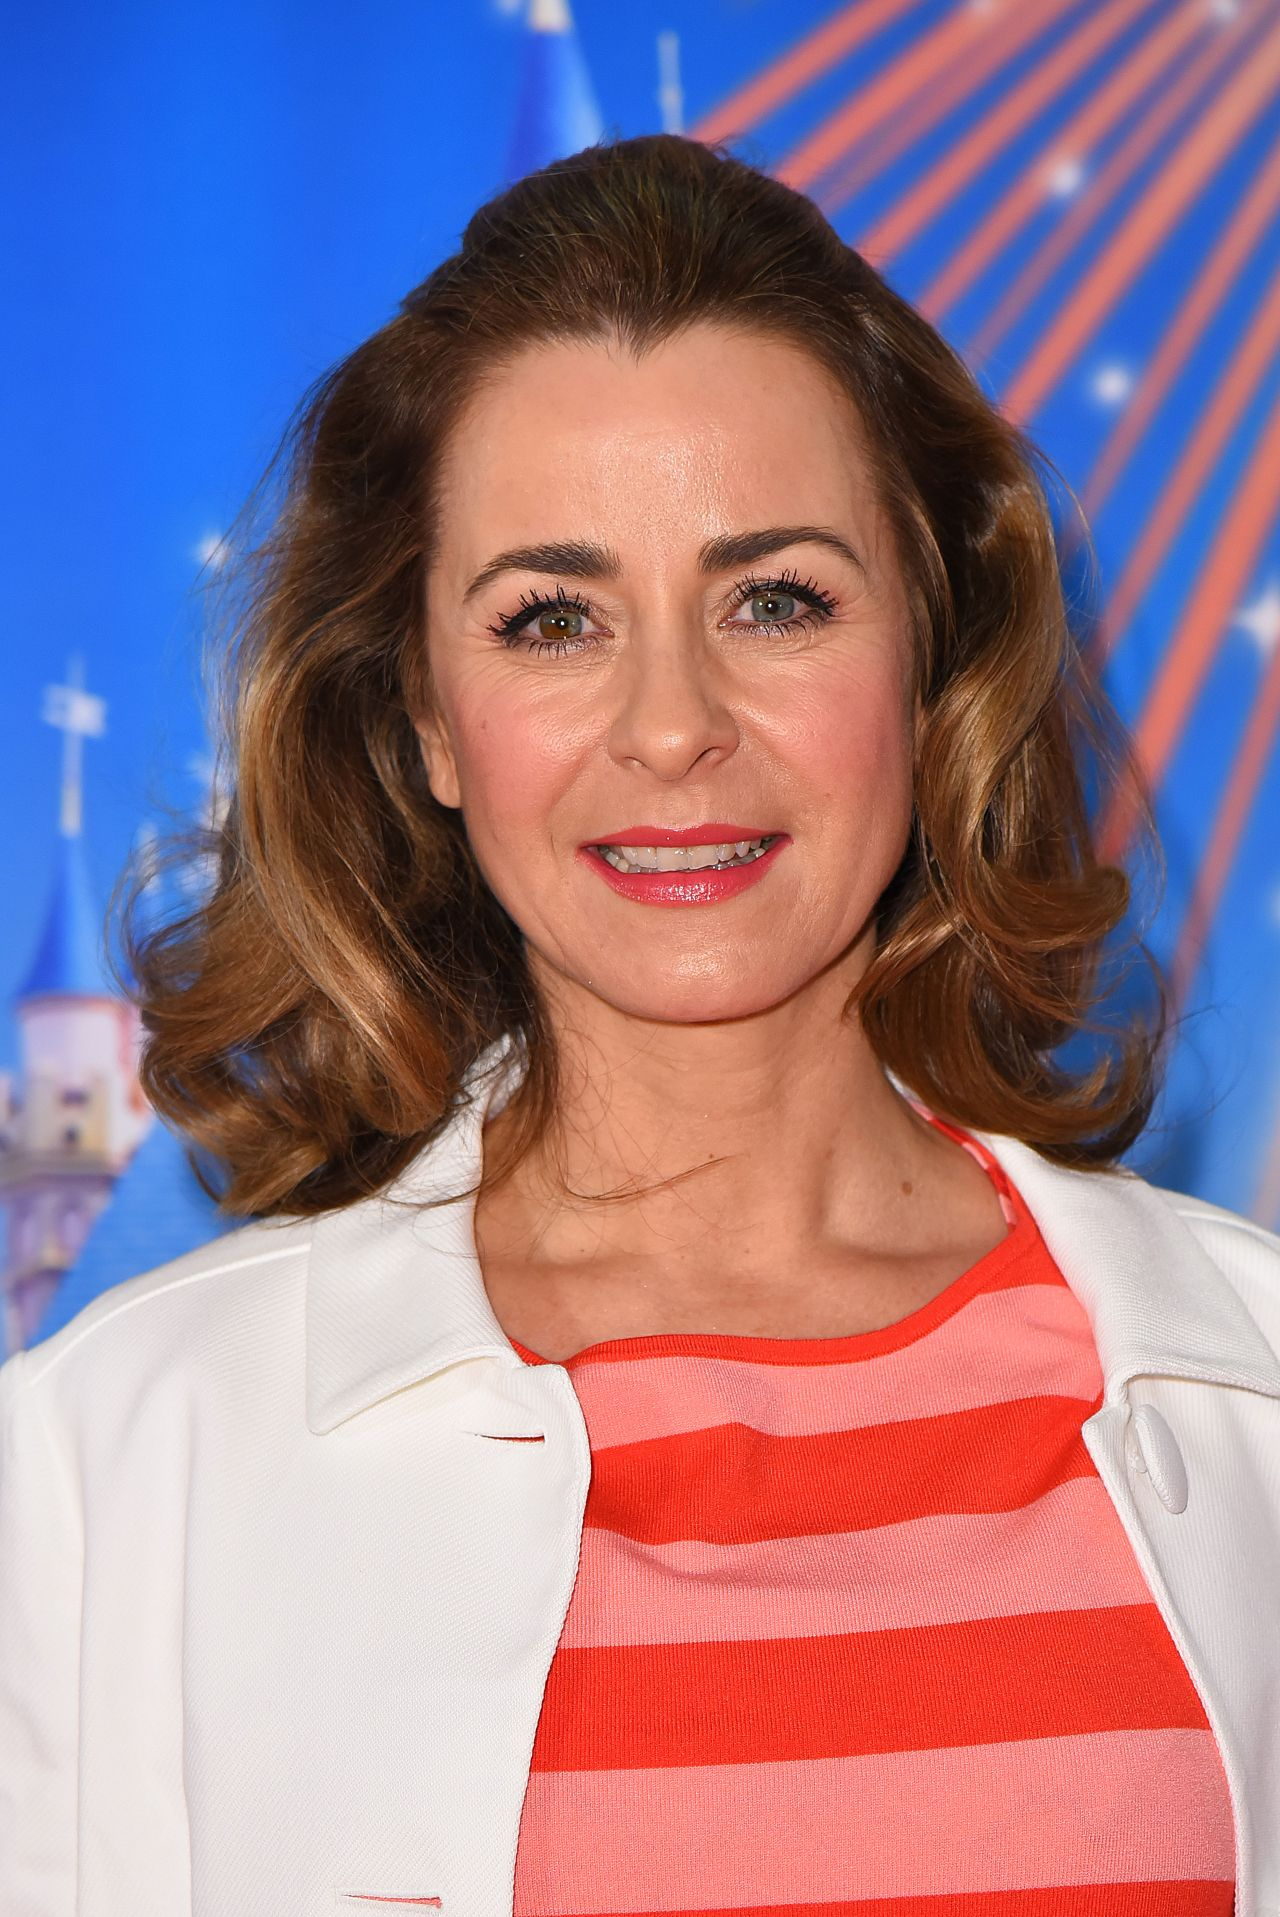 Bettina Cramer – 'Disney on ice' Premiere in Velodrom, Berlin 3/2/ 2017